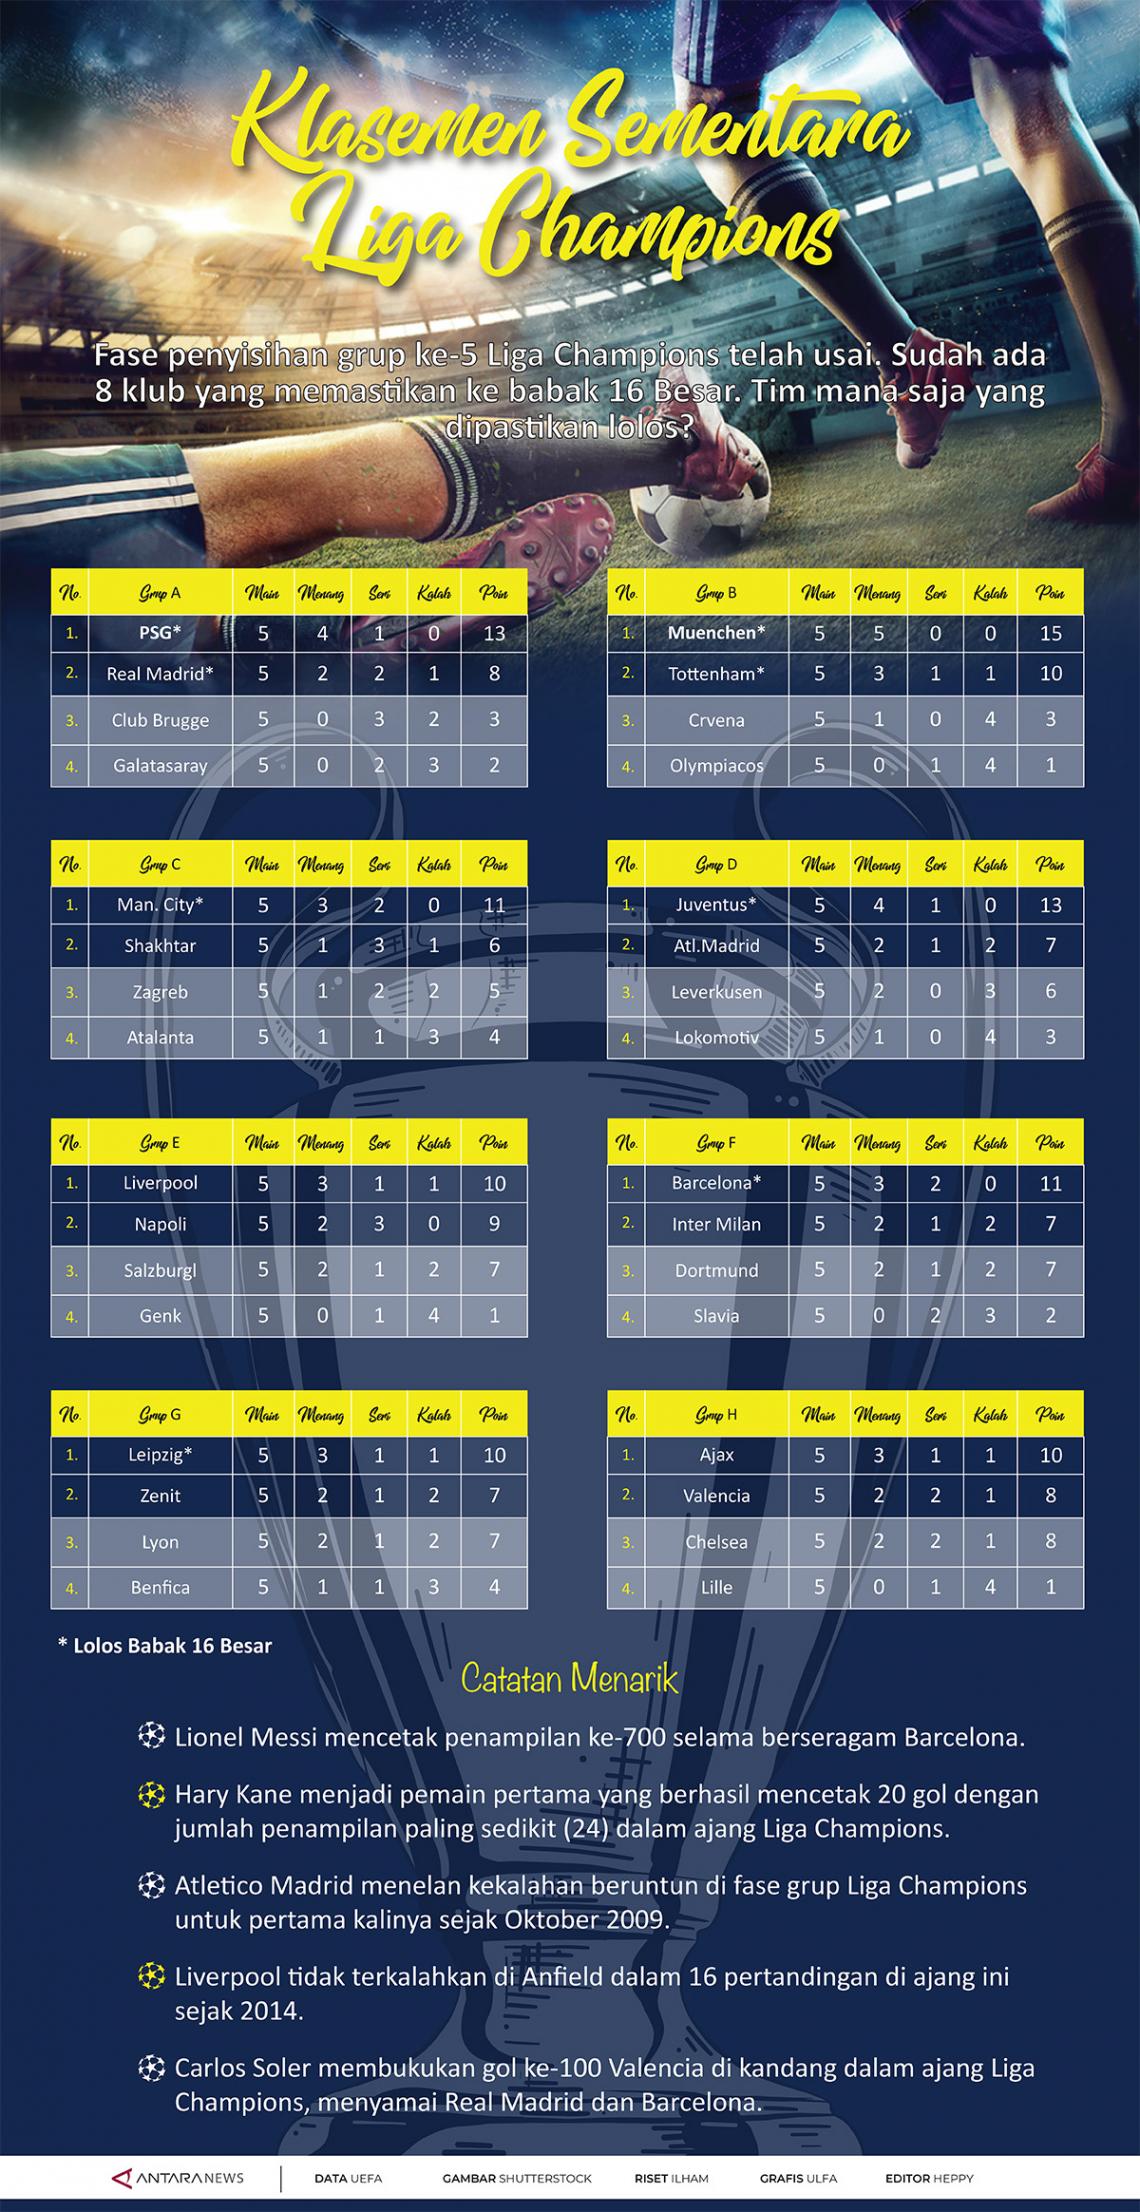 Klasemen sementara Liga Champions